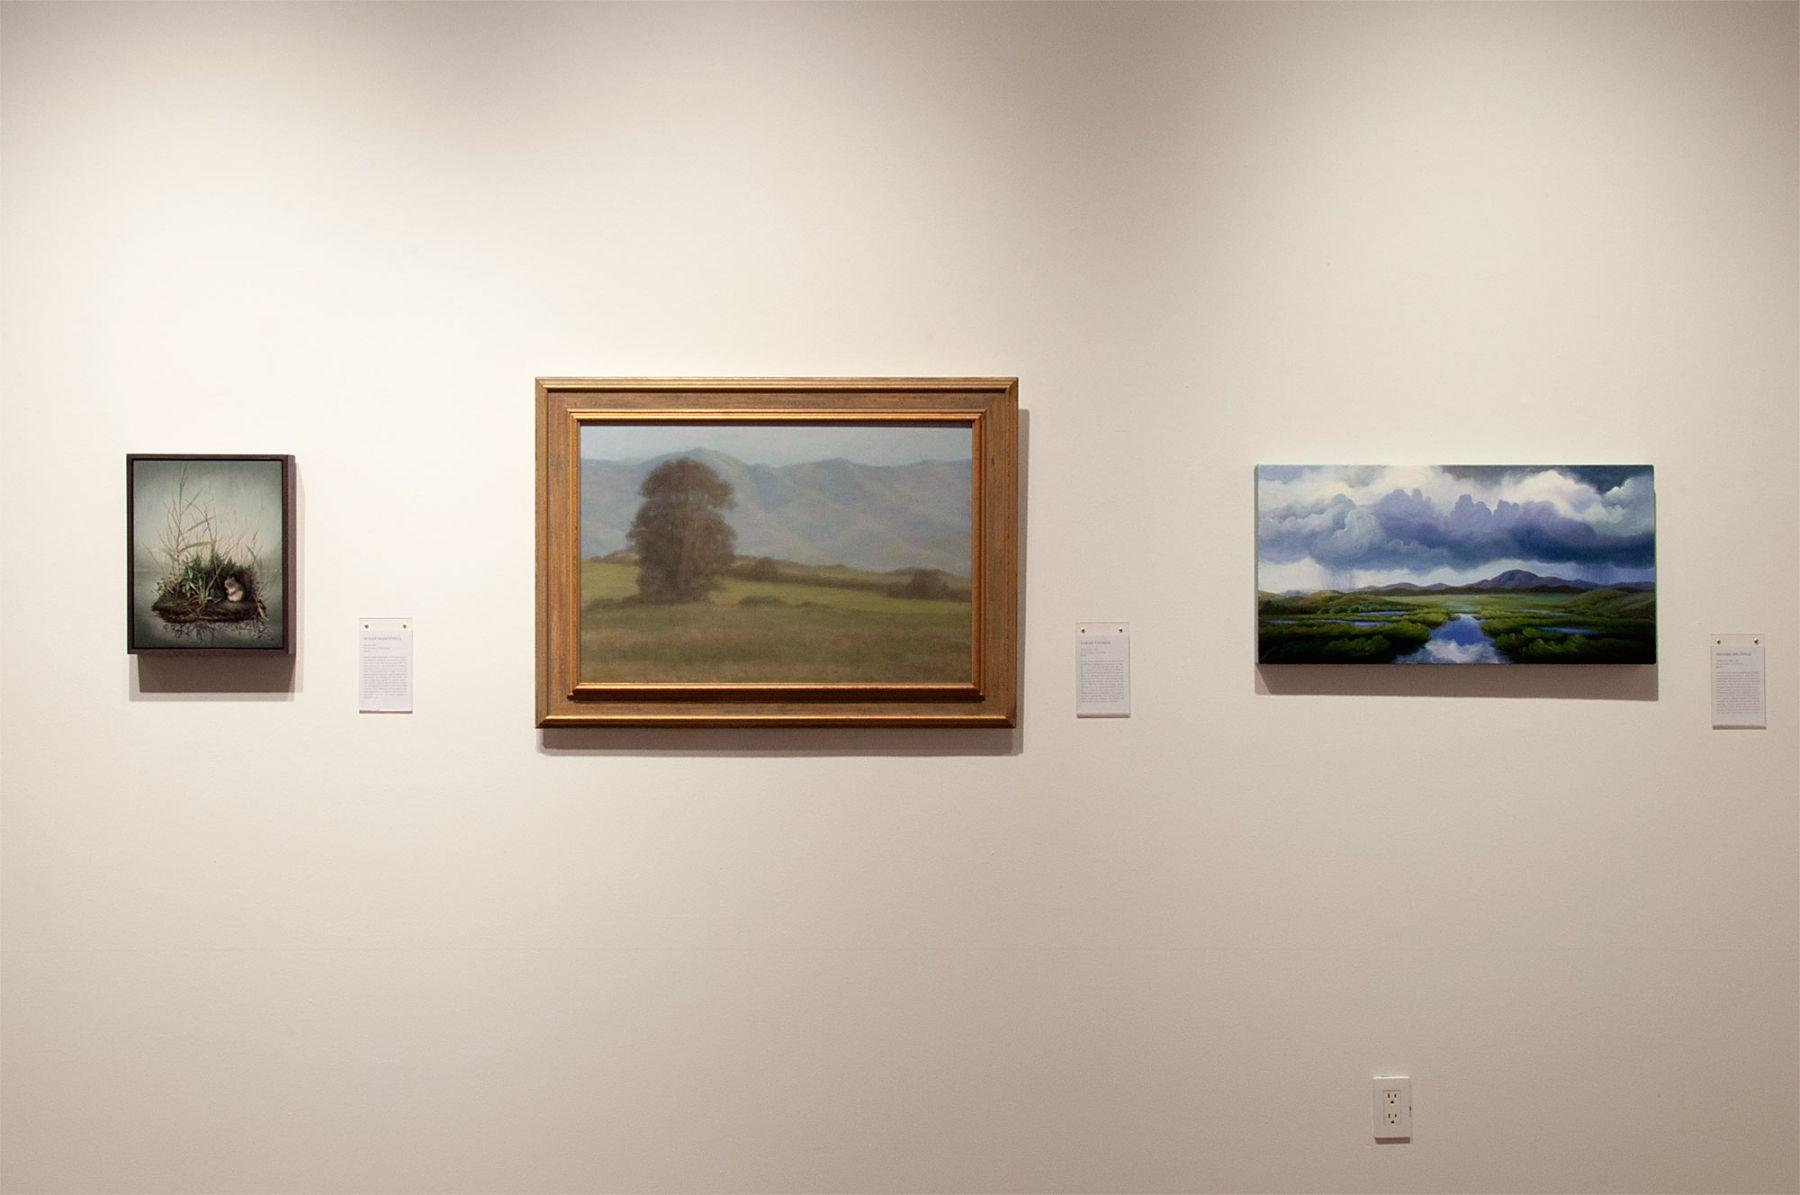 MASTERWORKS OF THE ARTISTS OF SULLIVAN GOSS exhibition, Susan McDonnell, Sarah Vedder, Phoebe Brunner